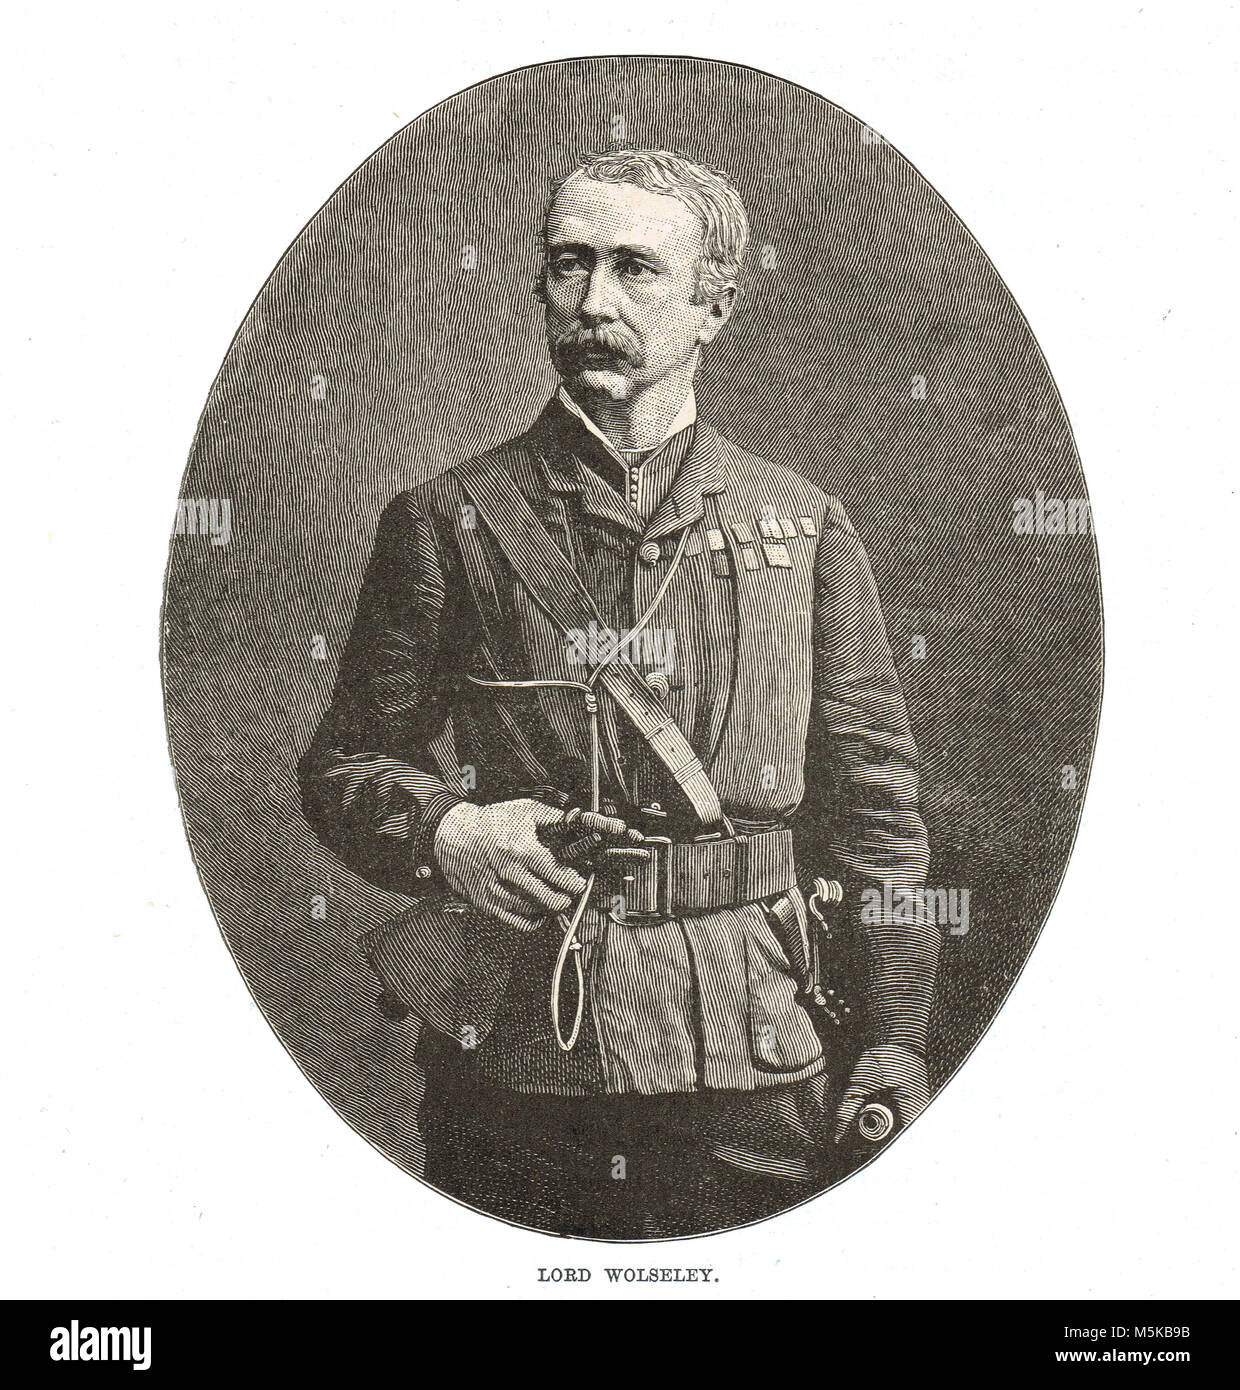 Field Marshal Garnet Joseph Wolseley, 1st Viscount Wolseley - Stock Image